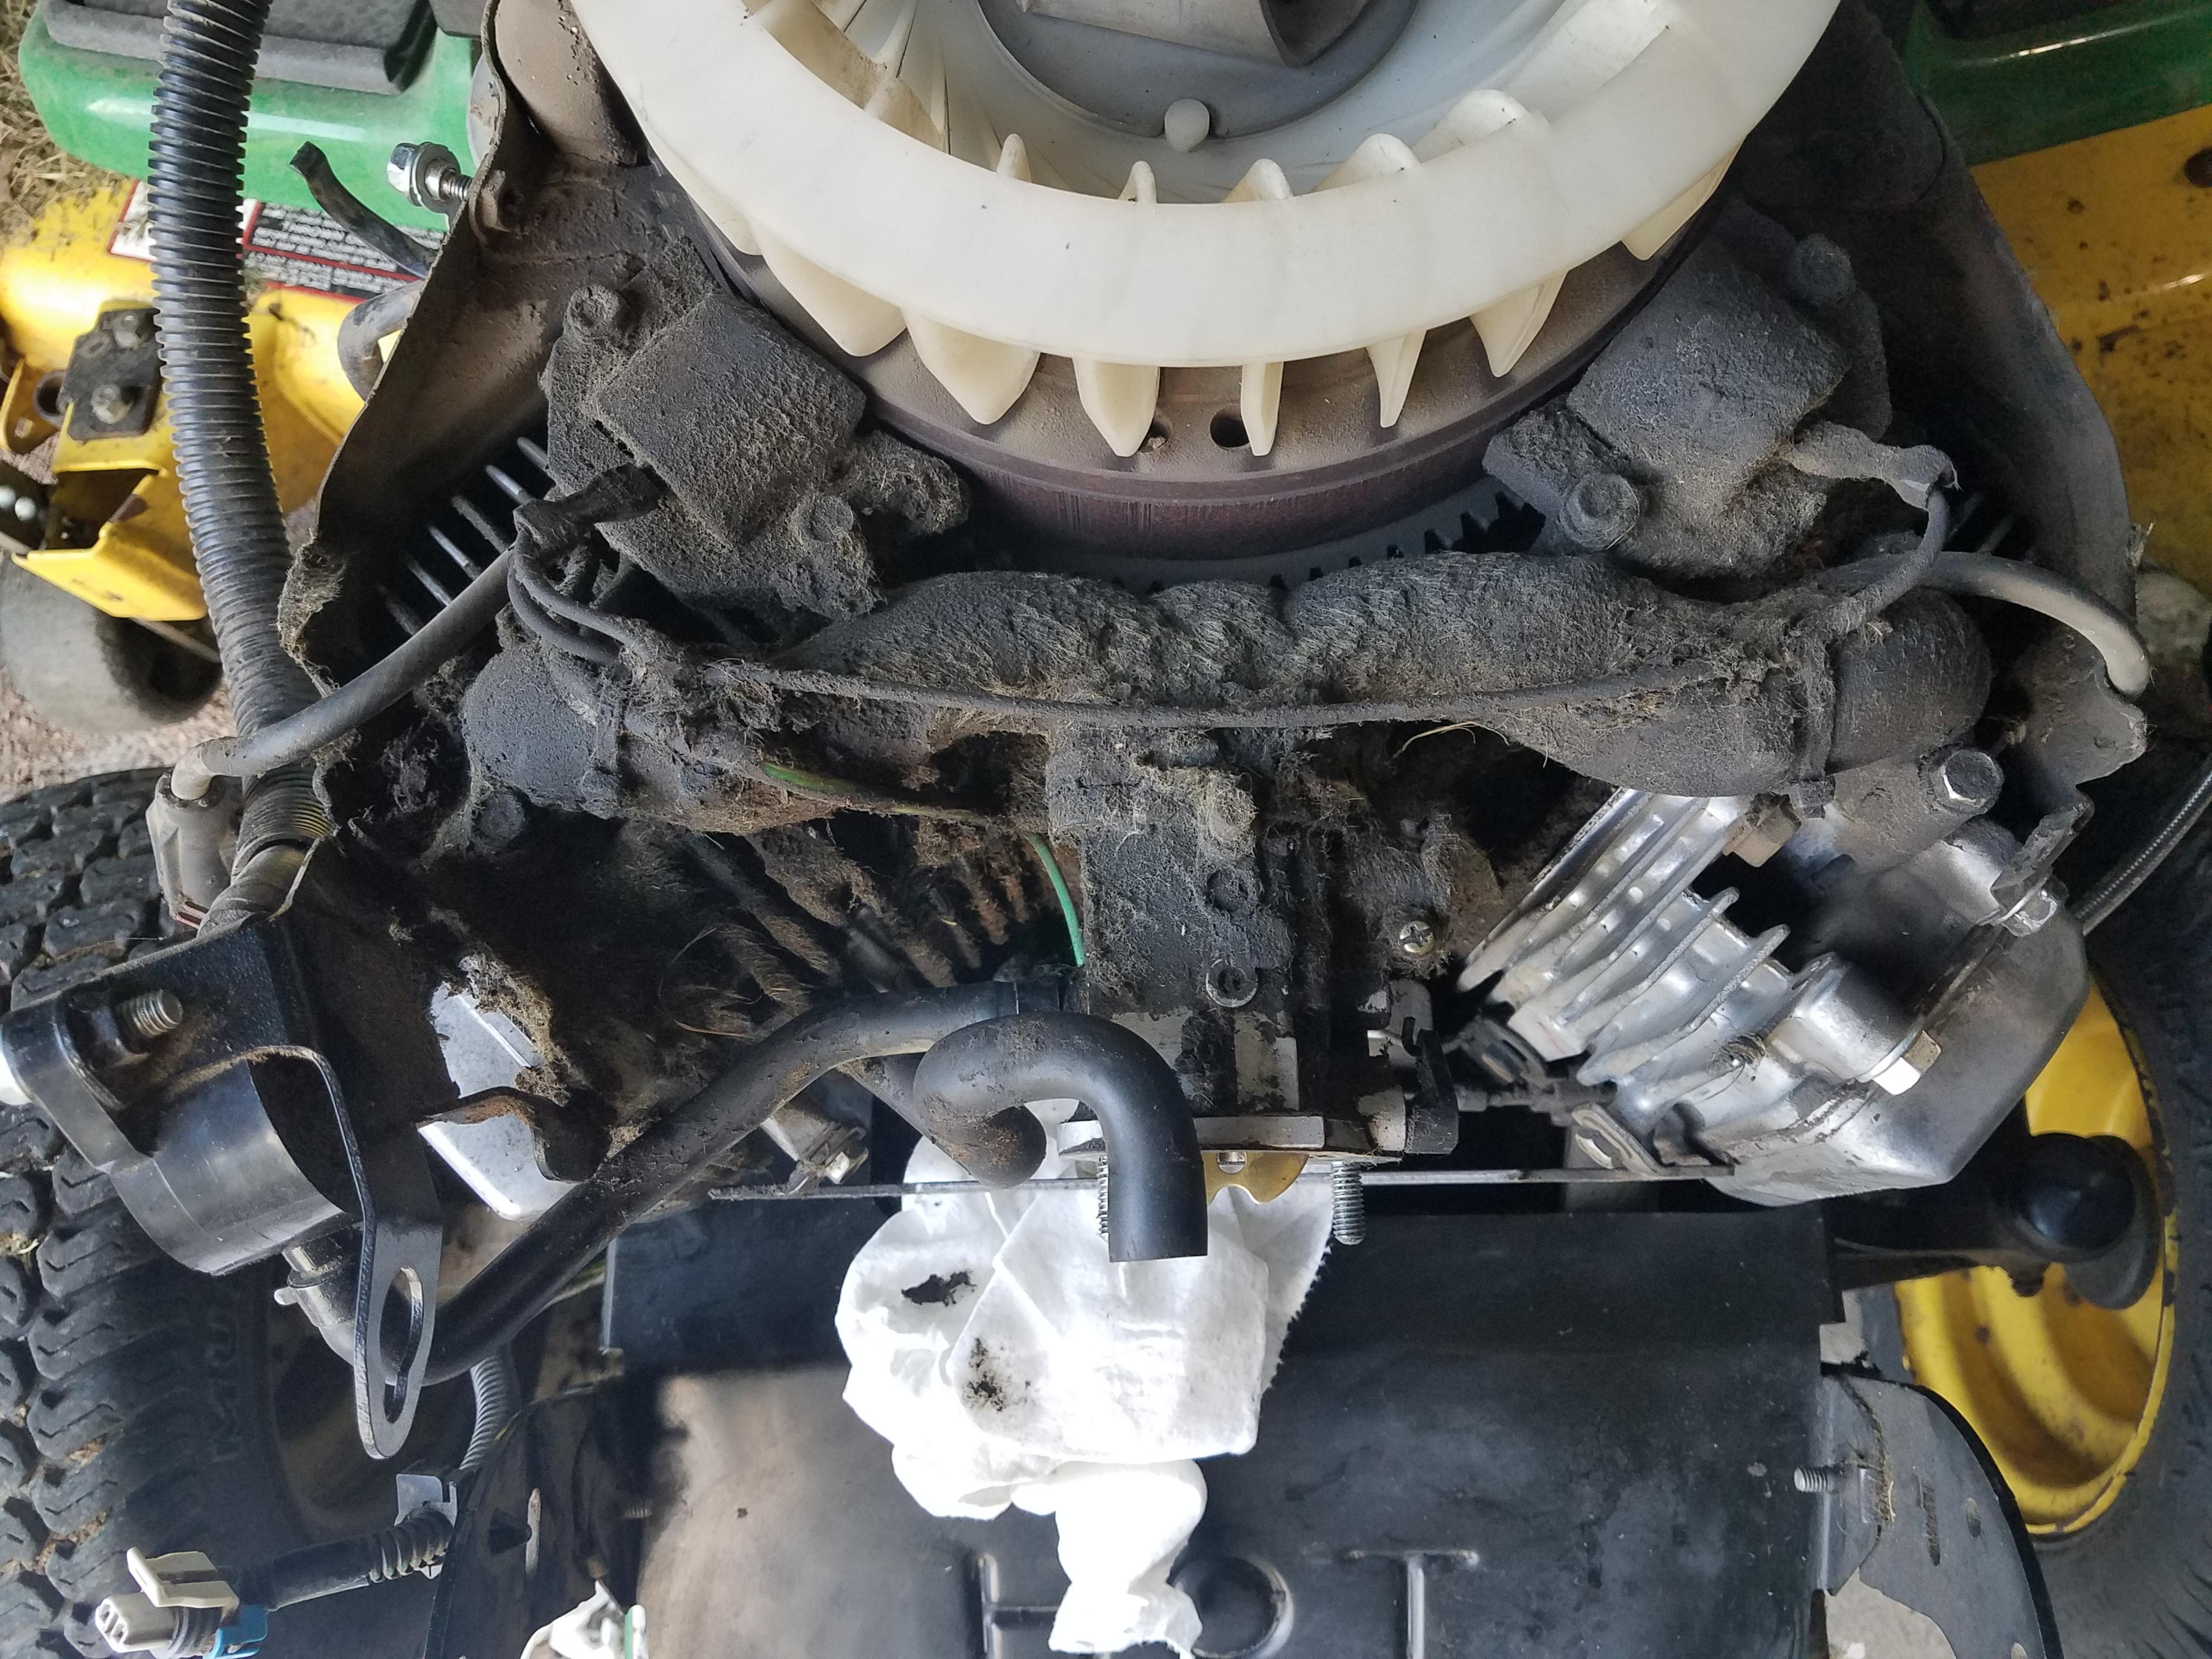 John Deere gt235 18hp Kawasaki leaking oil - MyTractorForum